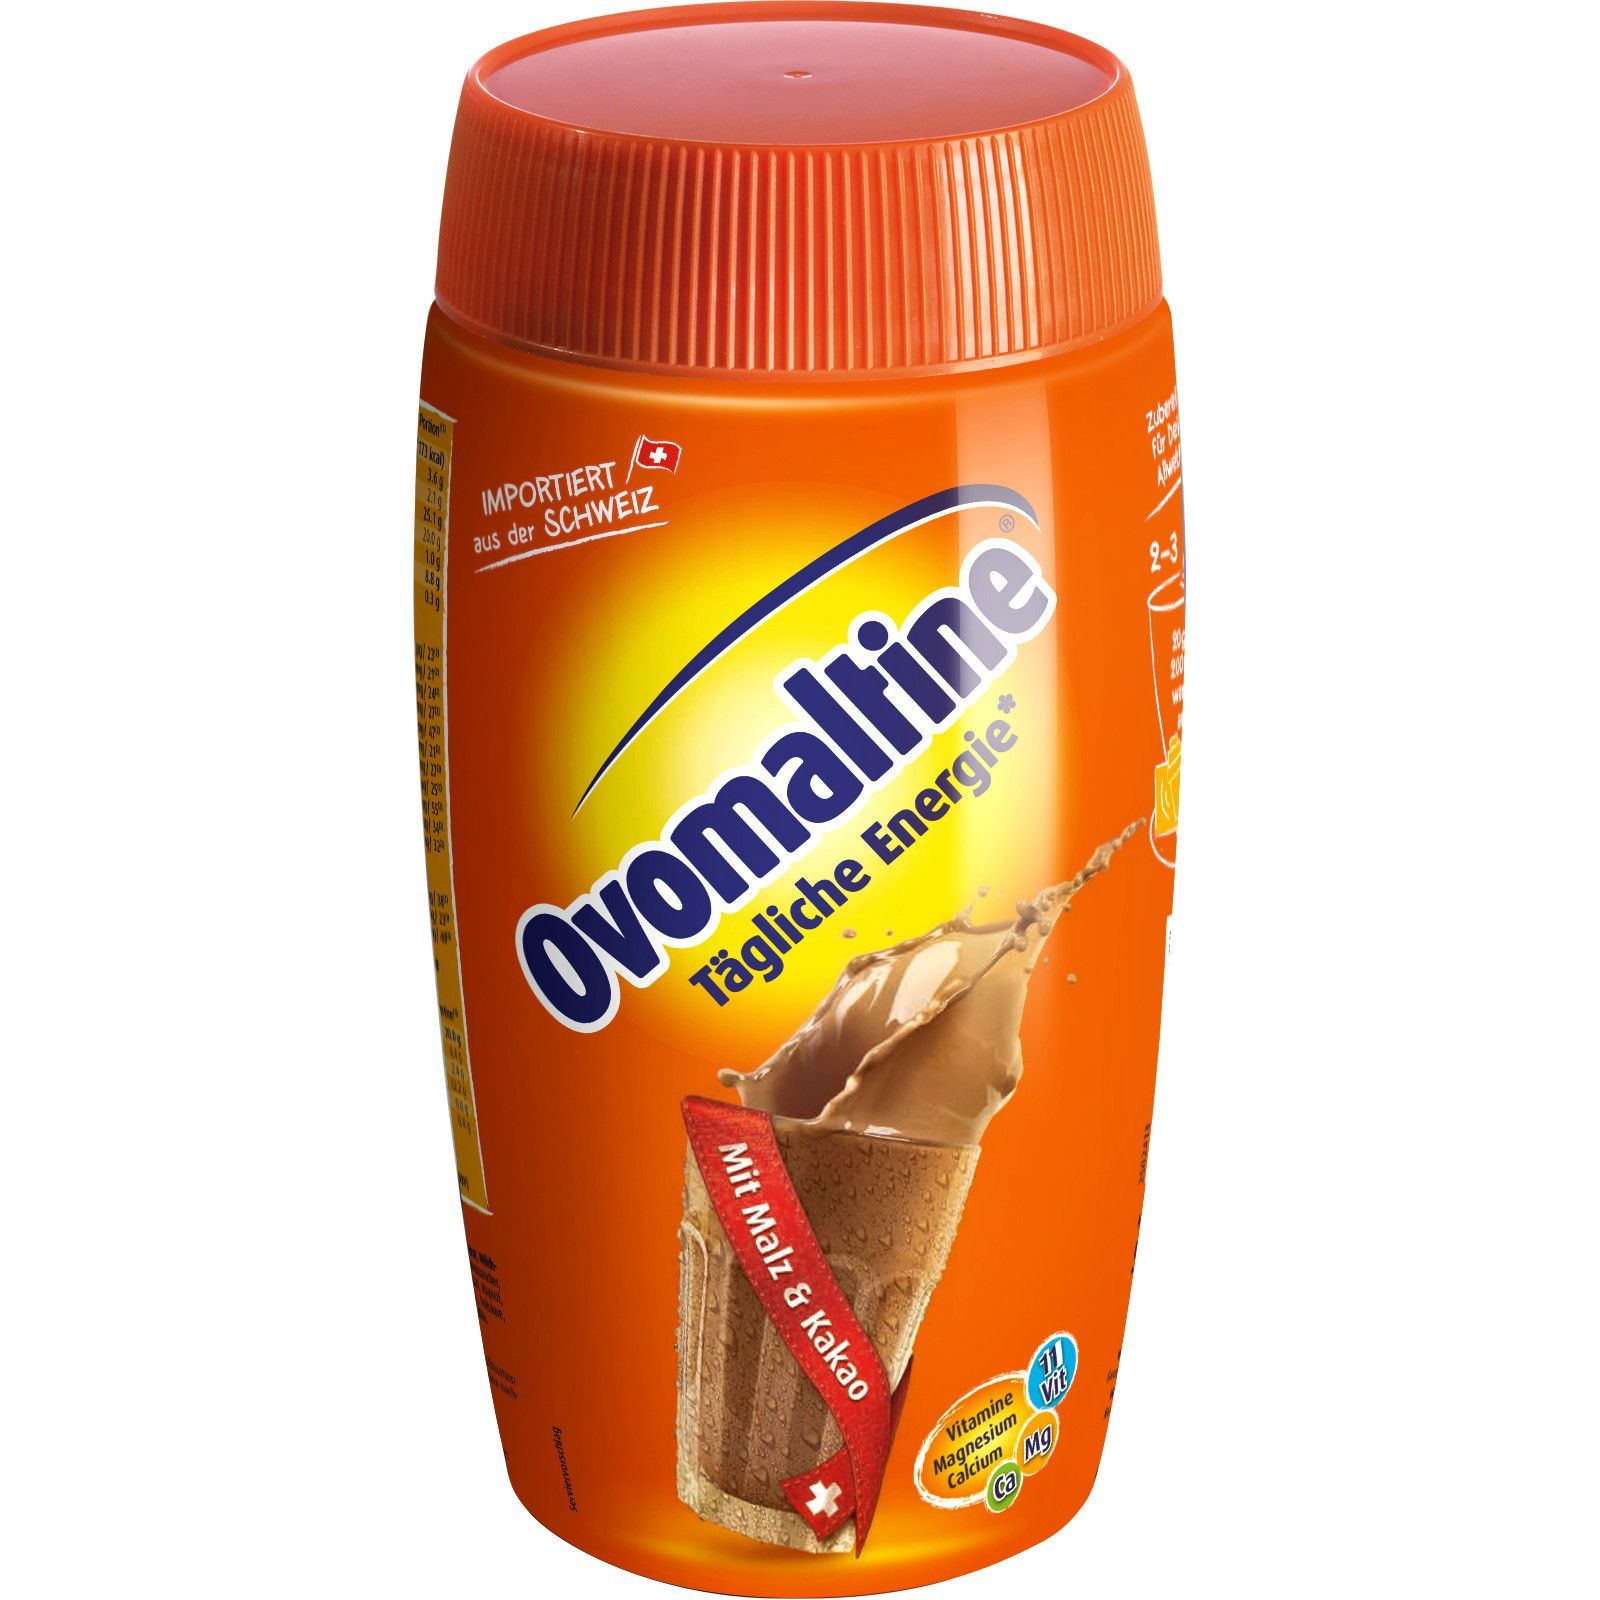 Nestle O2 Ovaltine Swiss Orange By Professional Daftar Nescafe Classic 120gram Kualitas Hotel Resto Ampamp Cafe In Usa Ovomaltine Cocoa Drink From Switzerland 500g Can